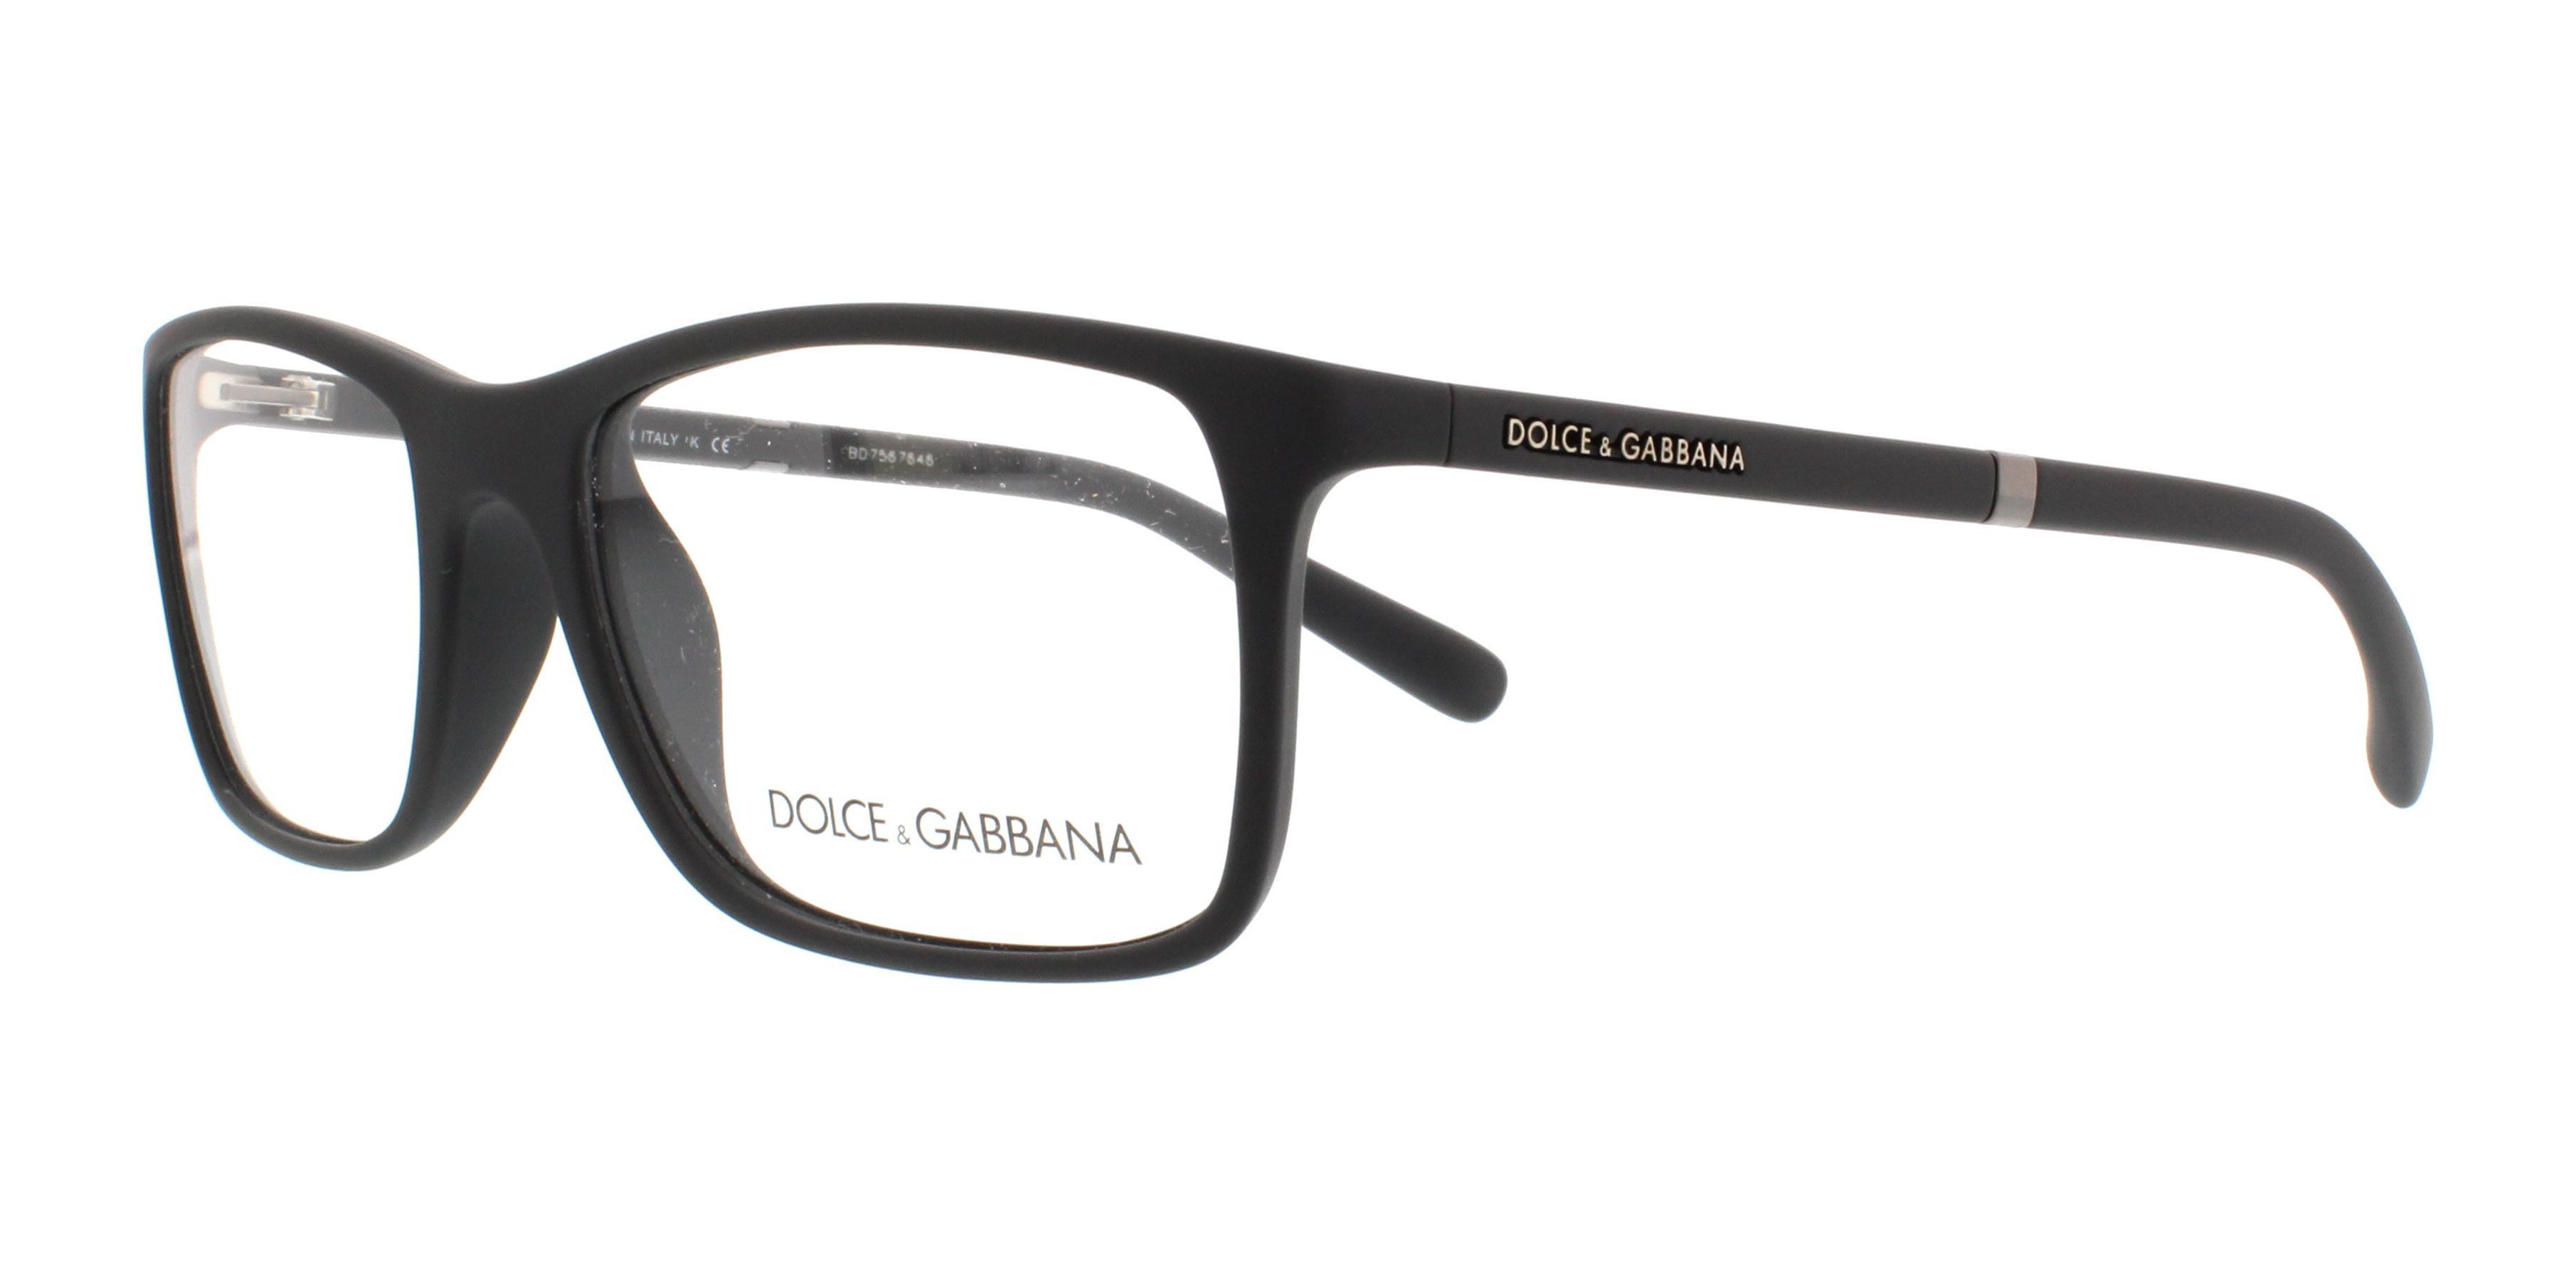 e11eda571818 Dolce And Gabbana Mens Eyeglass Frames - Bitterroot Public Library